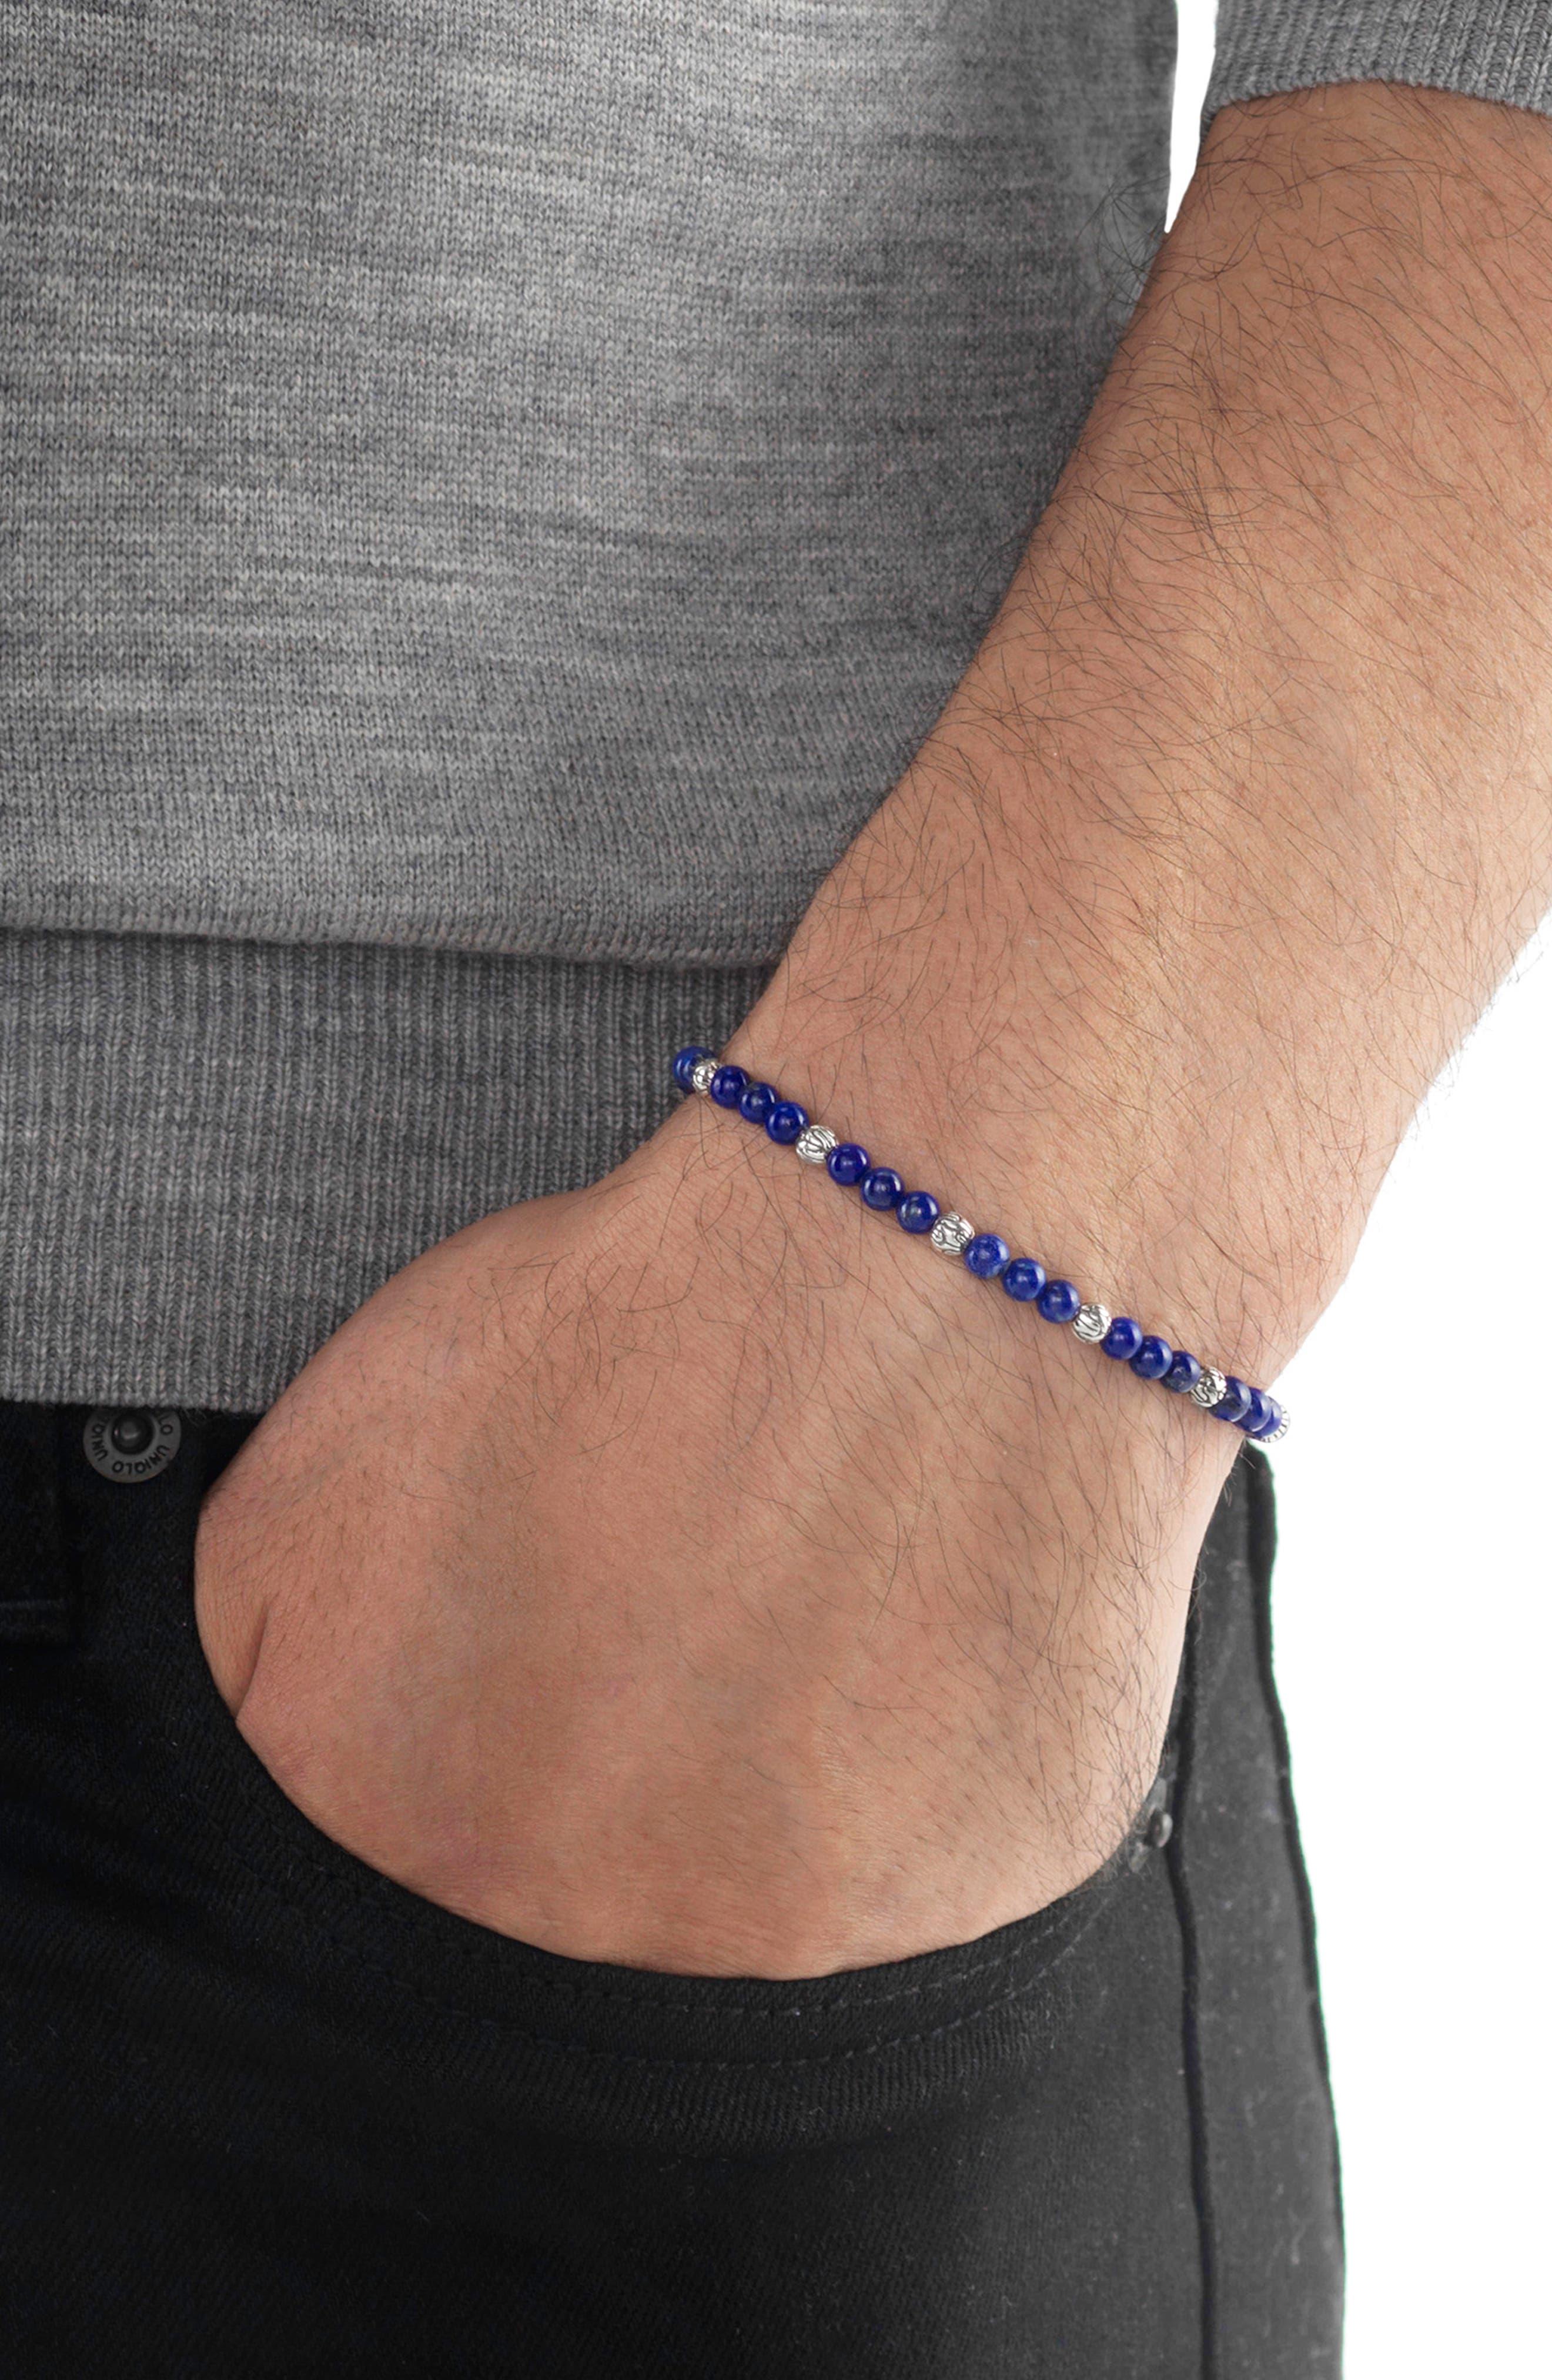 'Classic Chain' Beaded Friendship Bracelet,                             Alternate thumbnail 2, color,                             SILVER/ LAPIS LAZULI